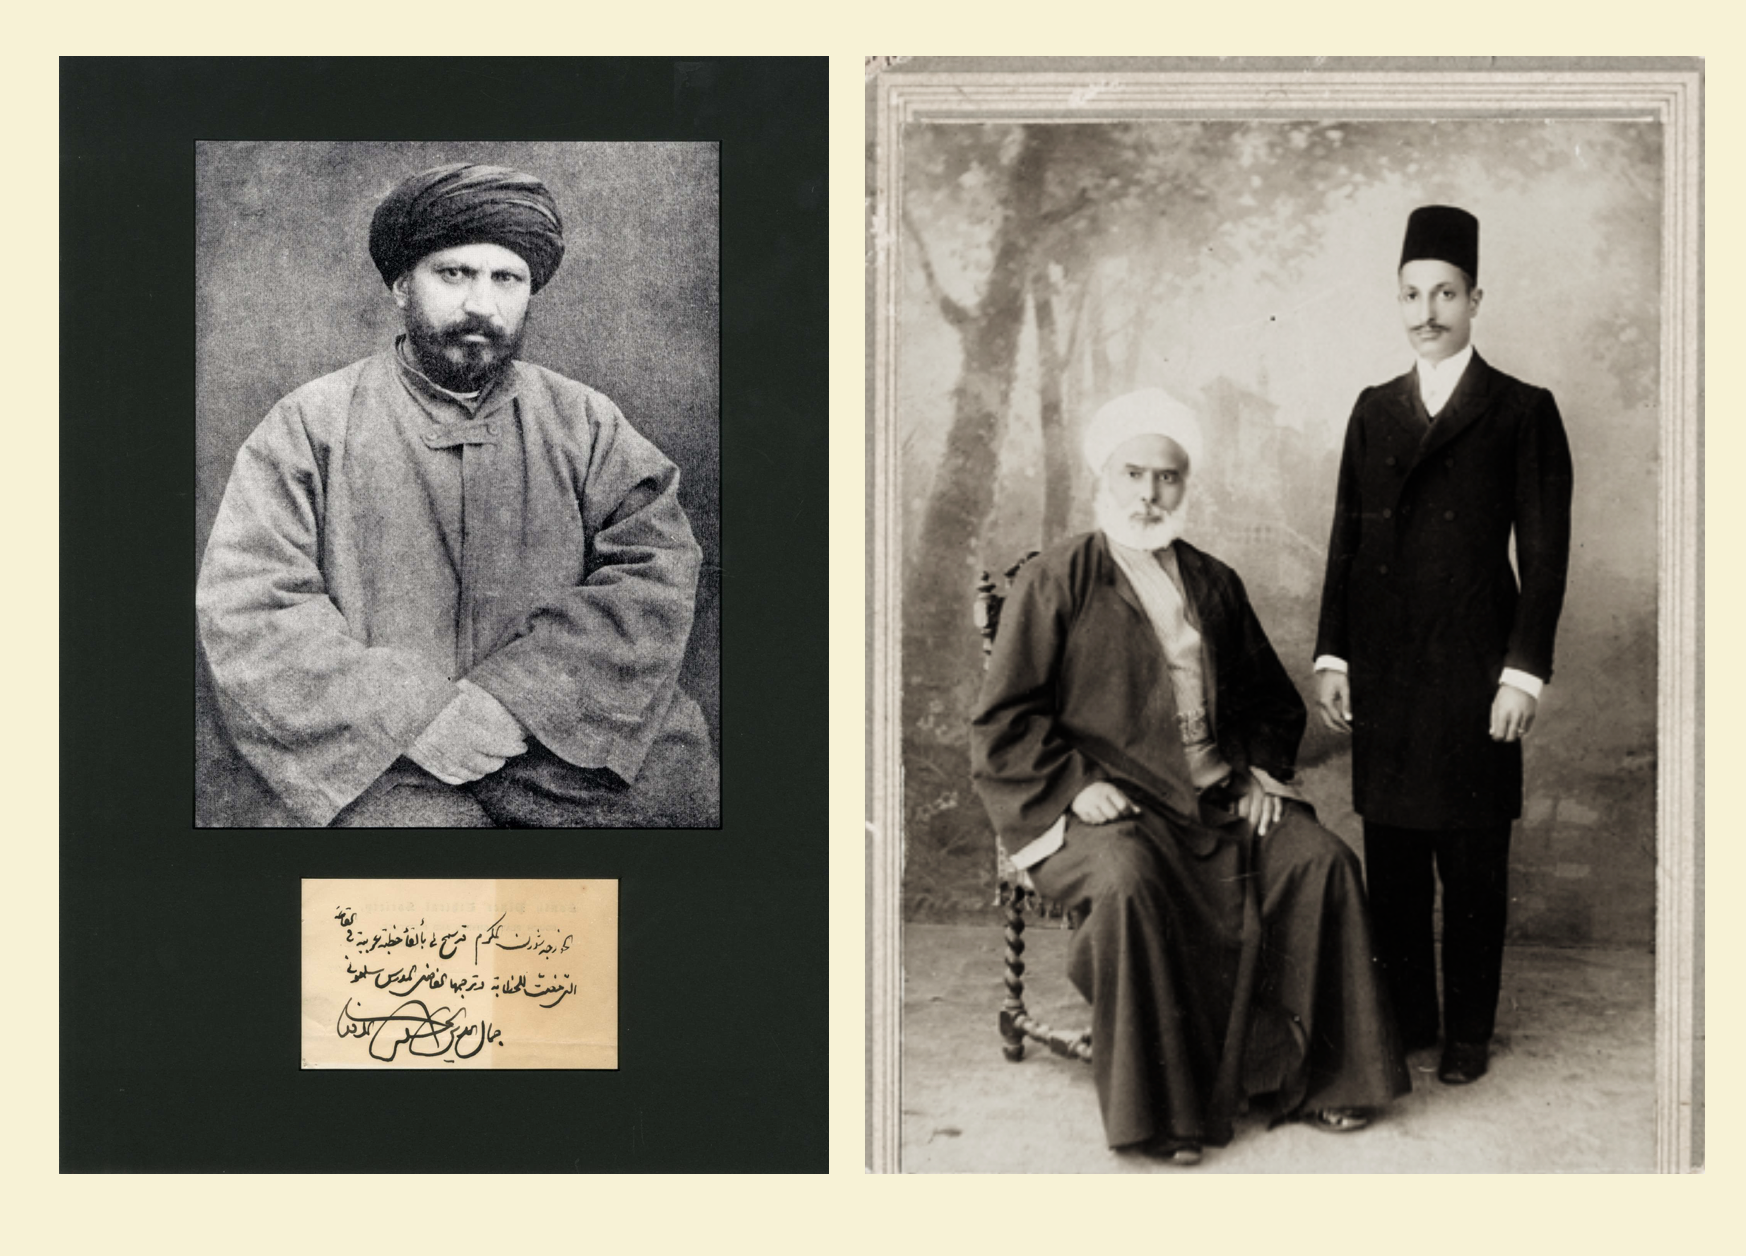 Herrera, L. (2002). The  soul of a nation :  Abdallah al-Nadim  and educational reform in Egypt (1845-1896).  Mediterranean Journal of Educational Studies , 7(1), 1-24. (image: Jamal al-Din al-Afghani (1939-1837), Mohamed Abduh, Prince Tawfik)